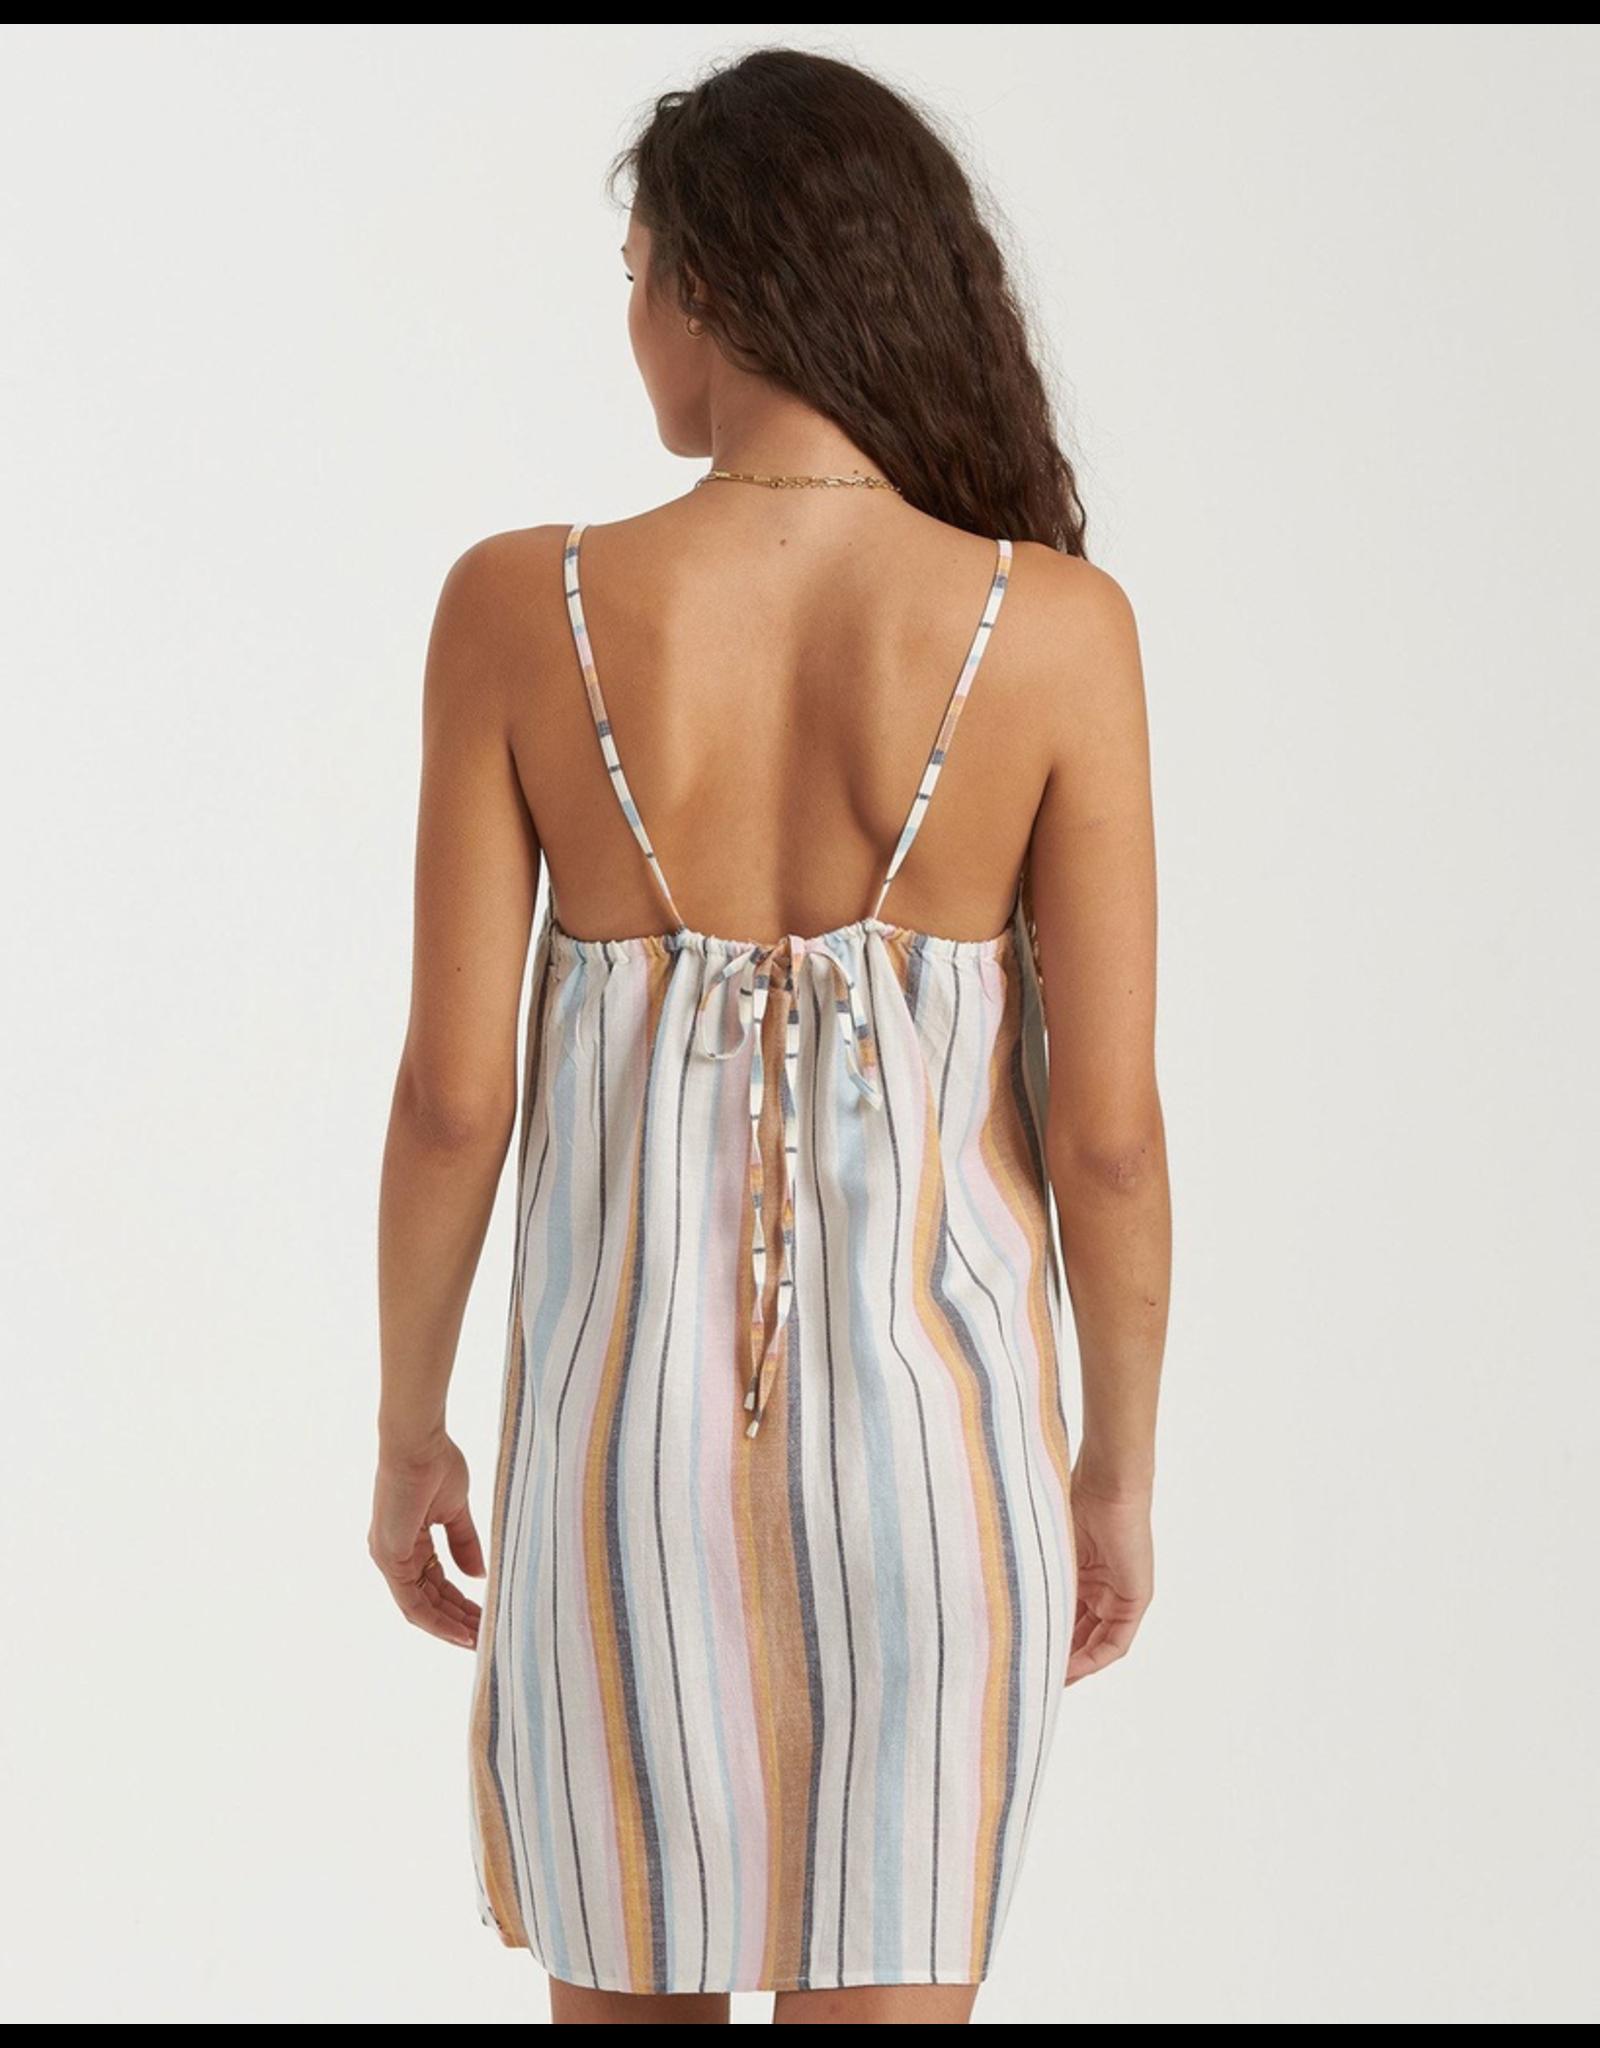 ALEXIS JANE DESIGN Day Dreamer Mini Dress